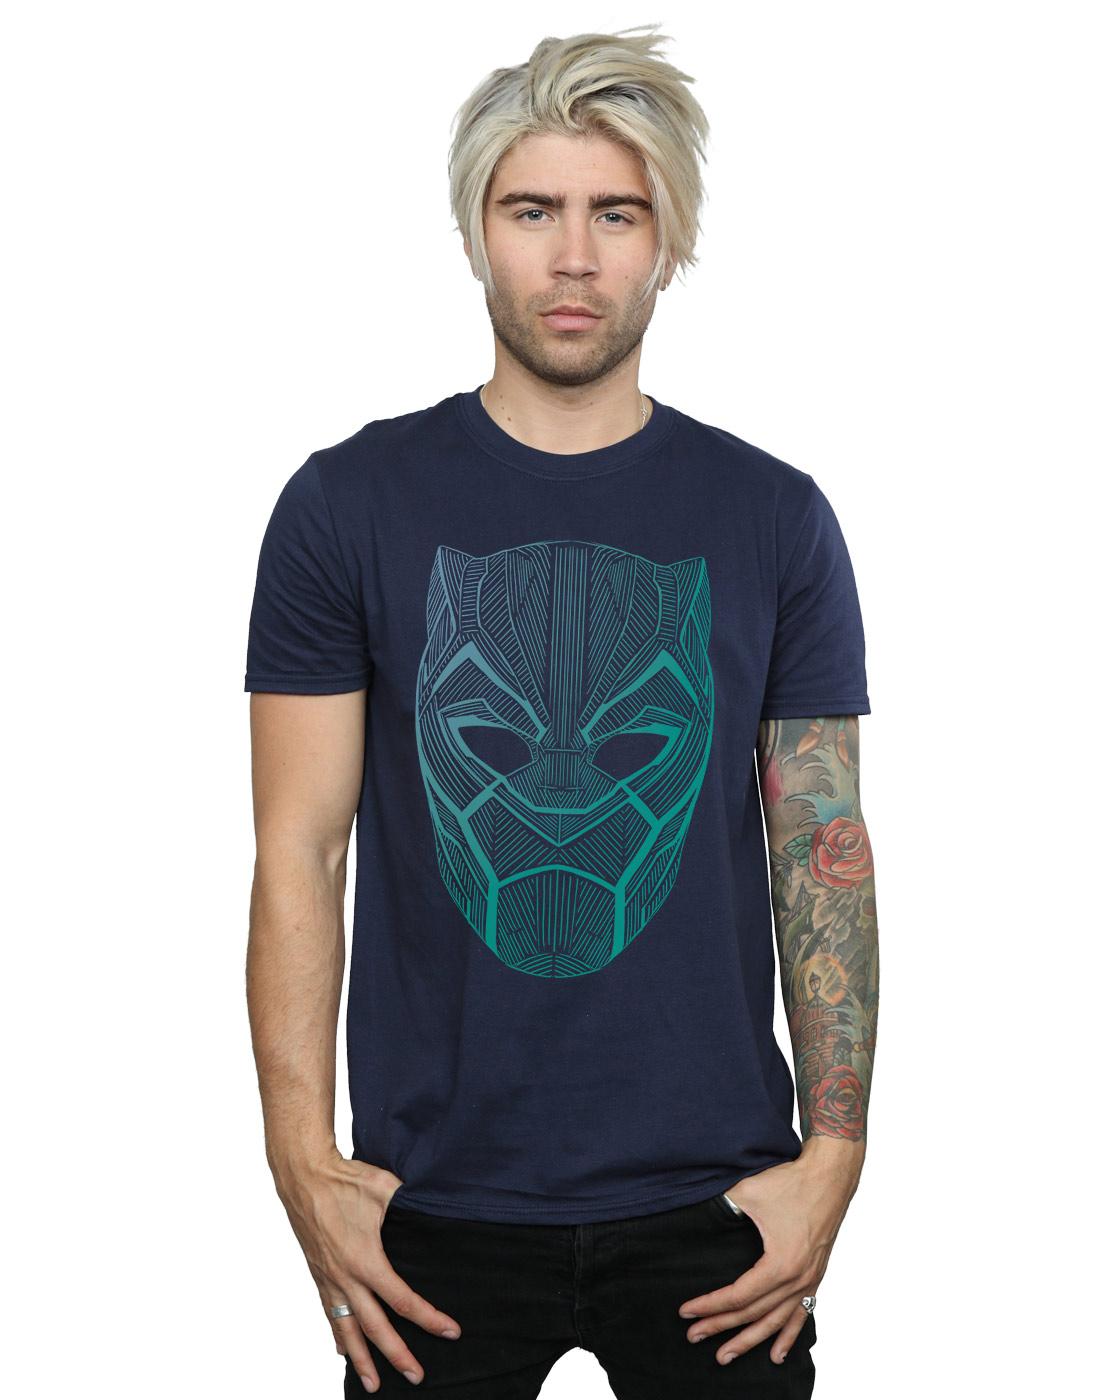 Black Panther Mask Camiseta para Hombre